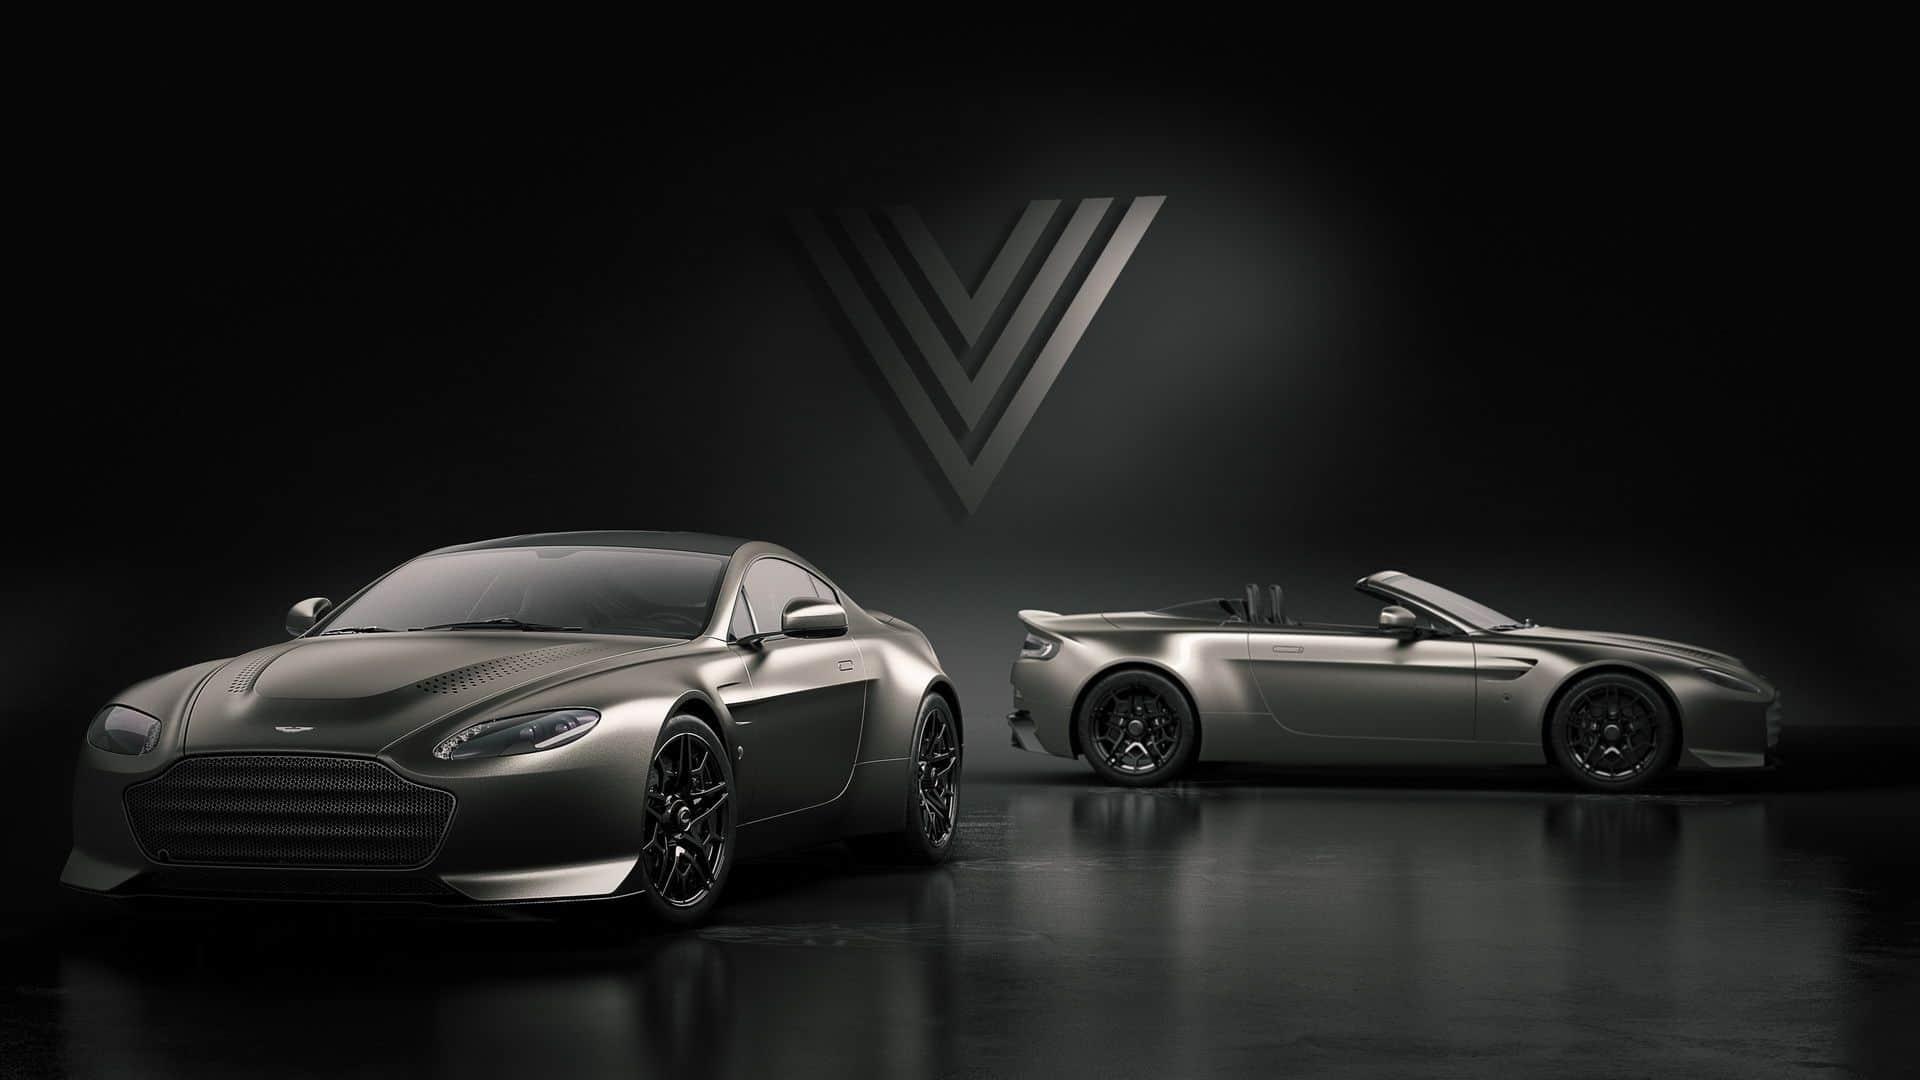 Aston Martin V12 Vantage V600